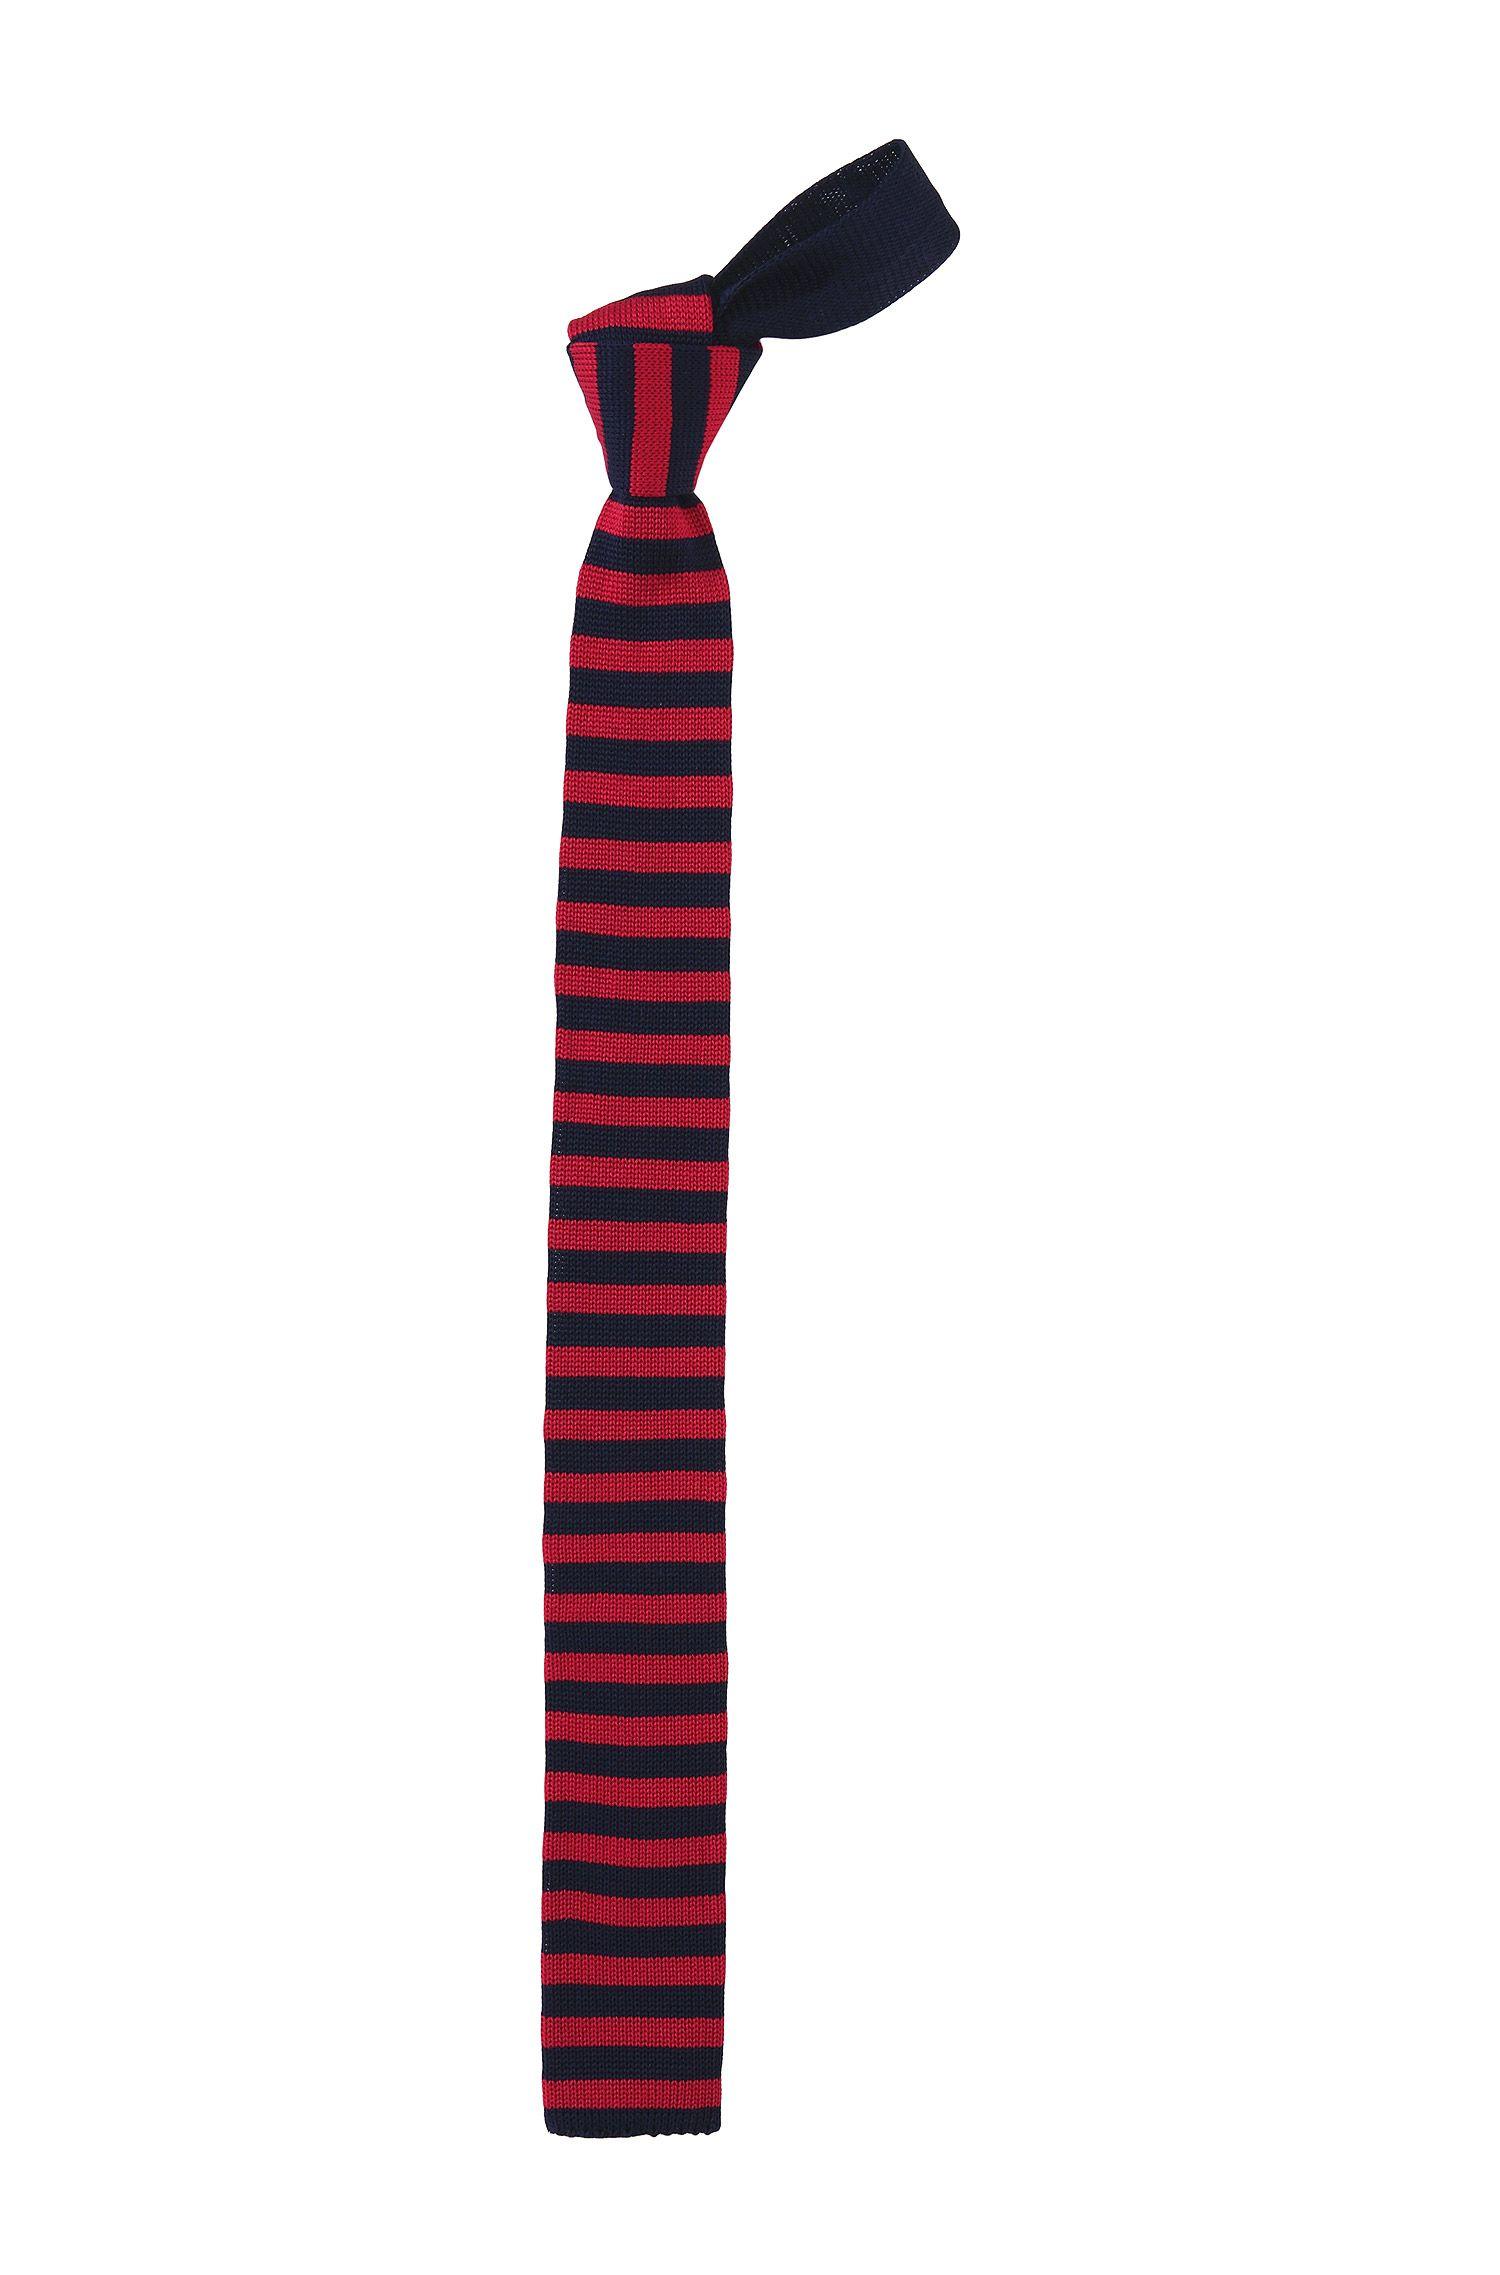 Das ´Tie 5 cm knitted` van gebreid katoen